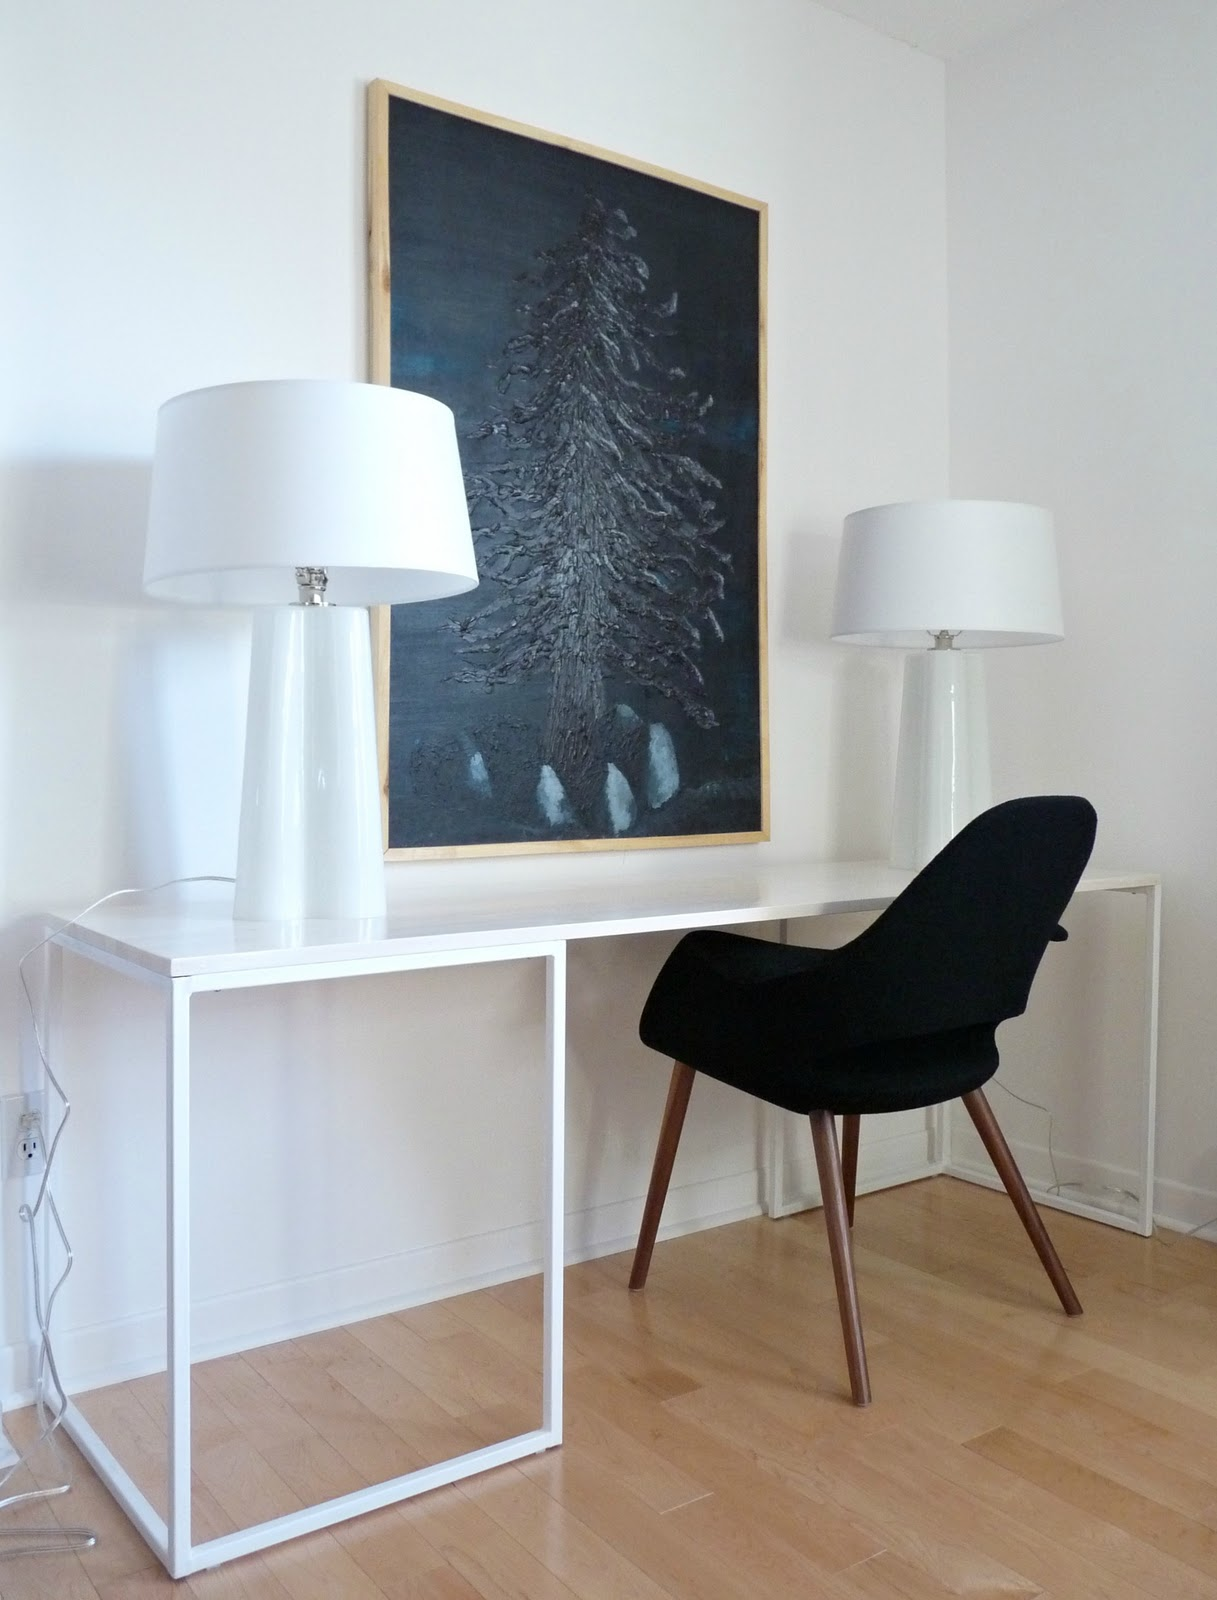 Desk Chair Diy Patio Covers Near Me Welded Complete Dans Le Lakehouse